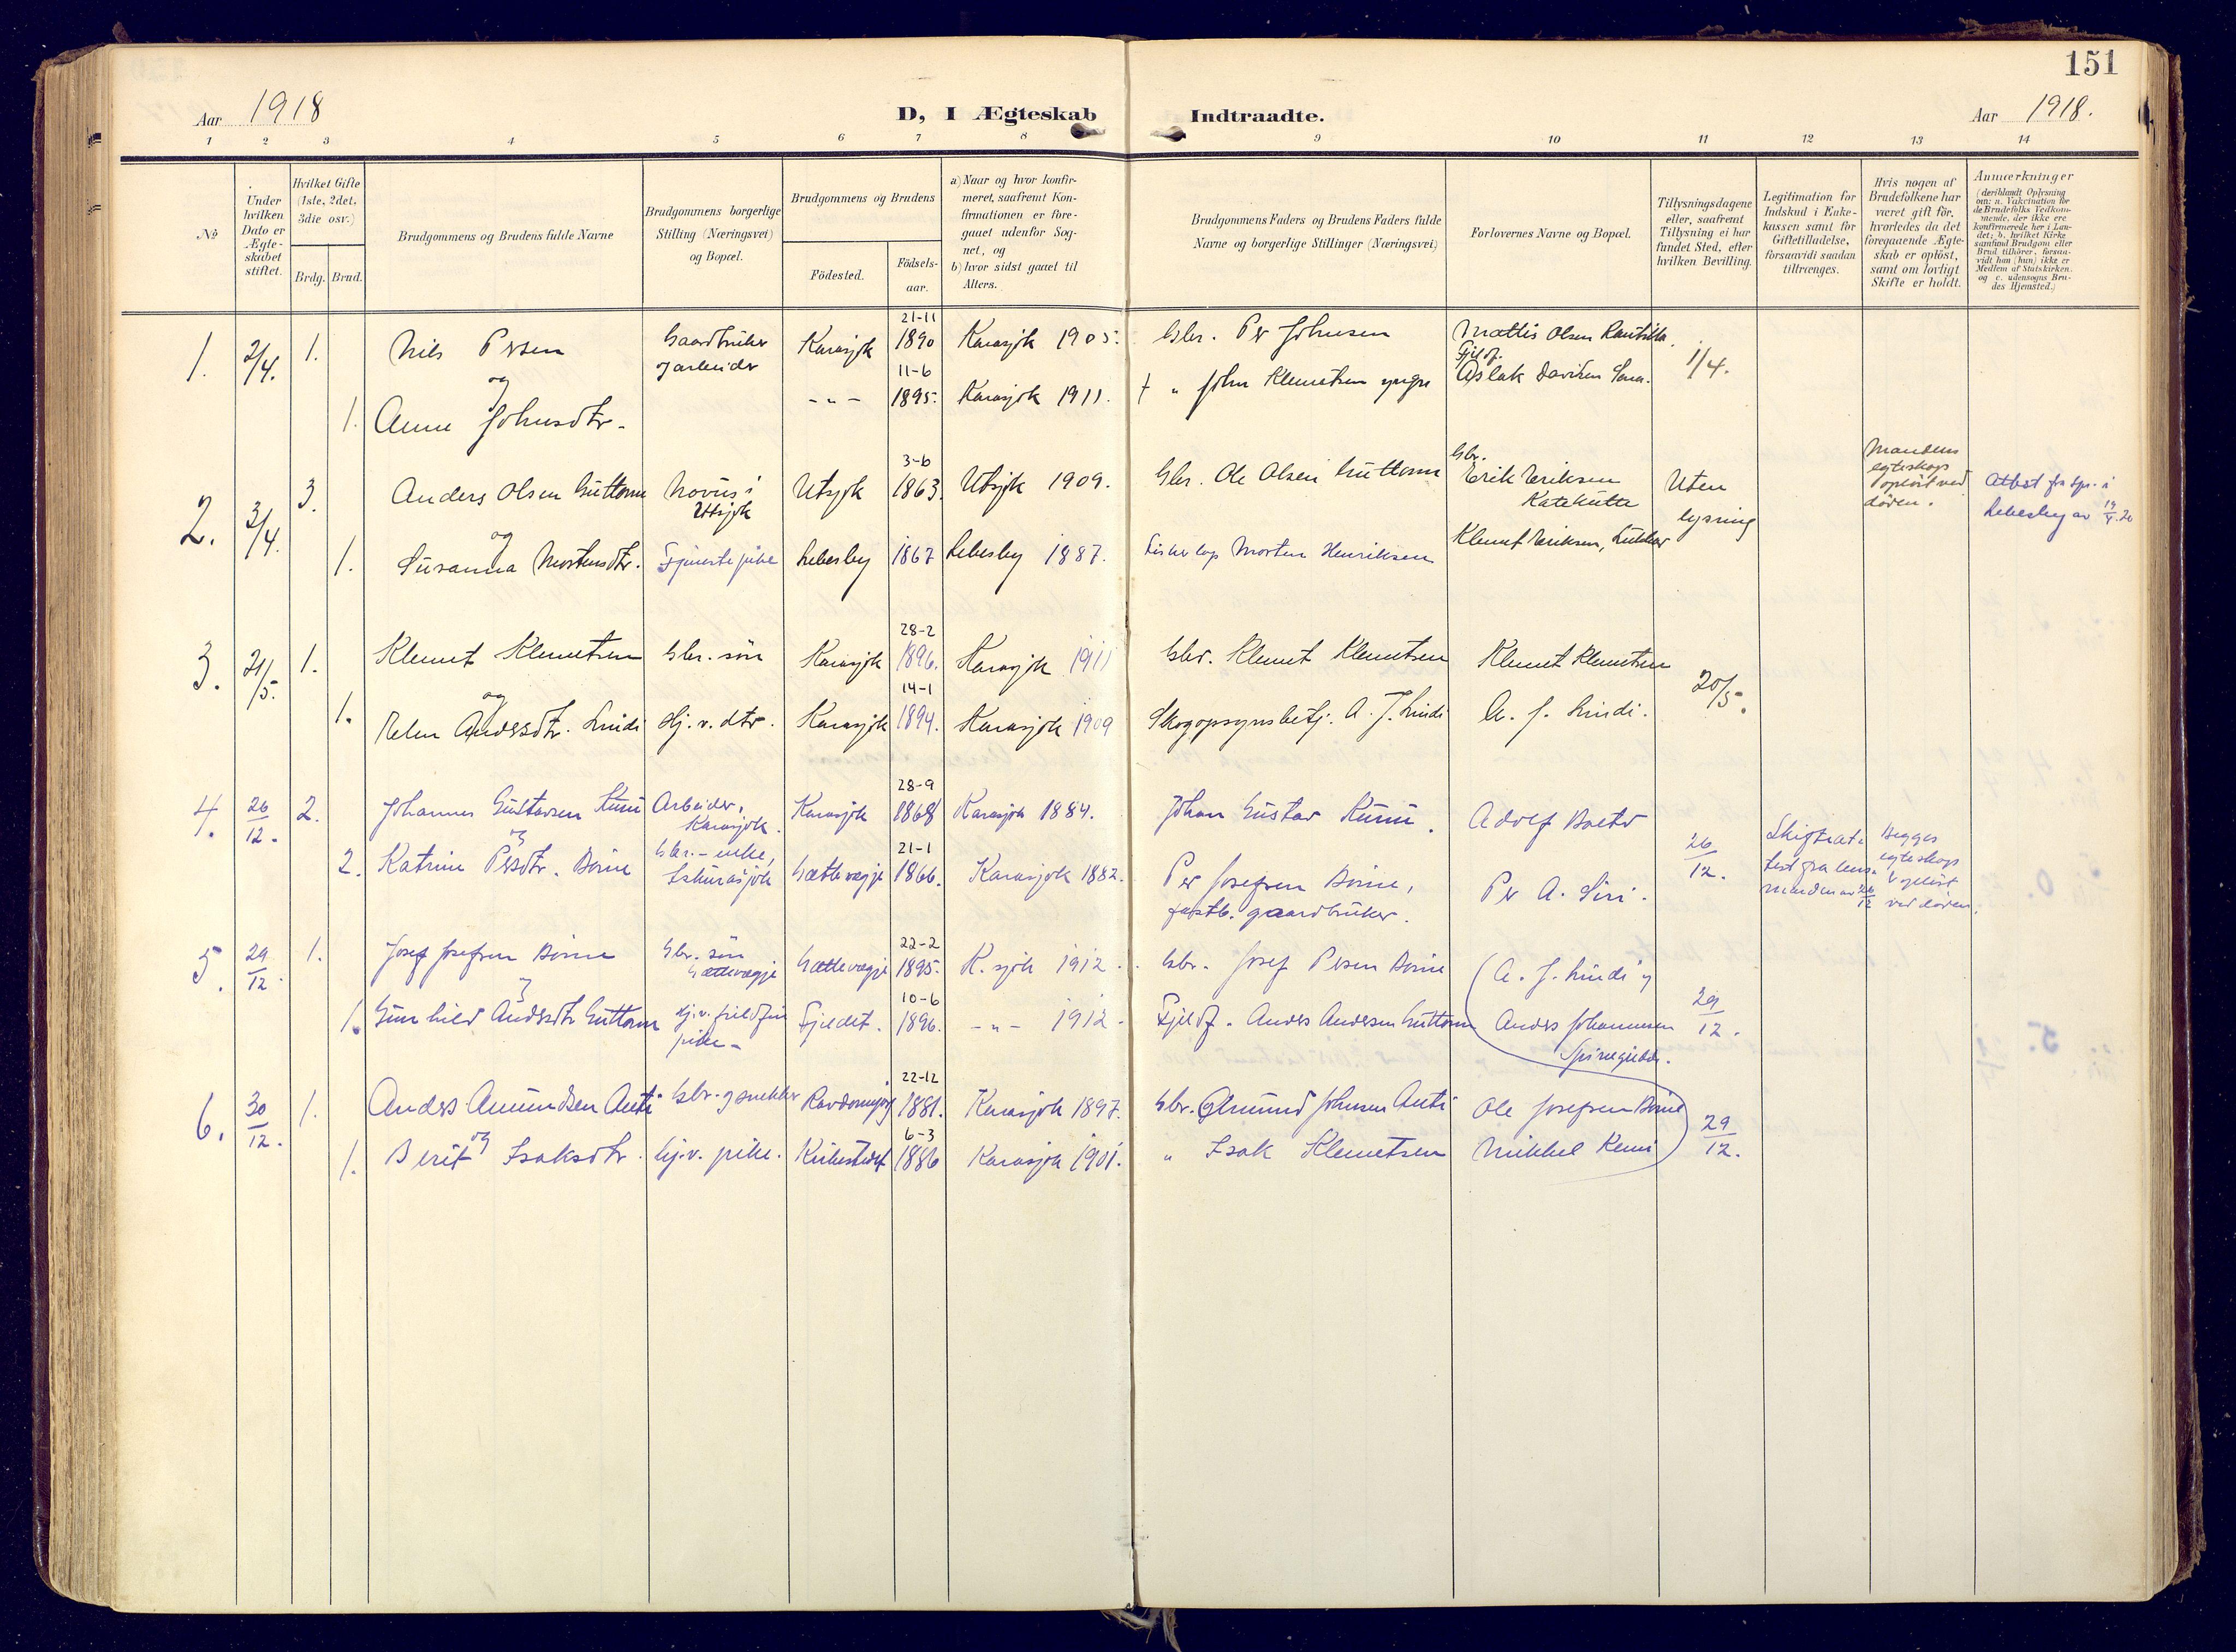 SATØ, Karasjok sokneprestkontor, H/Ha: Ministerialbok nr. 3, 1907-1926, s. 151